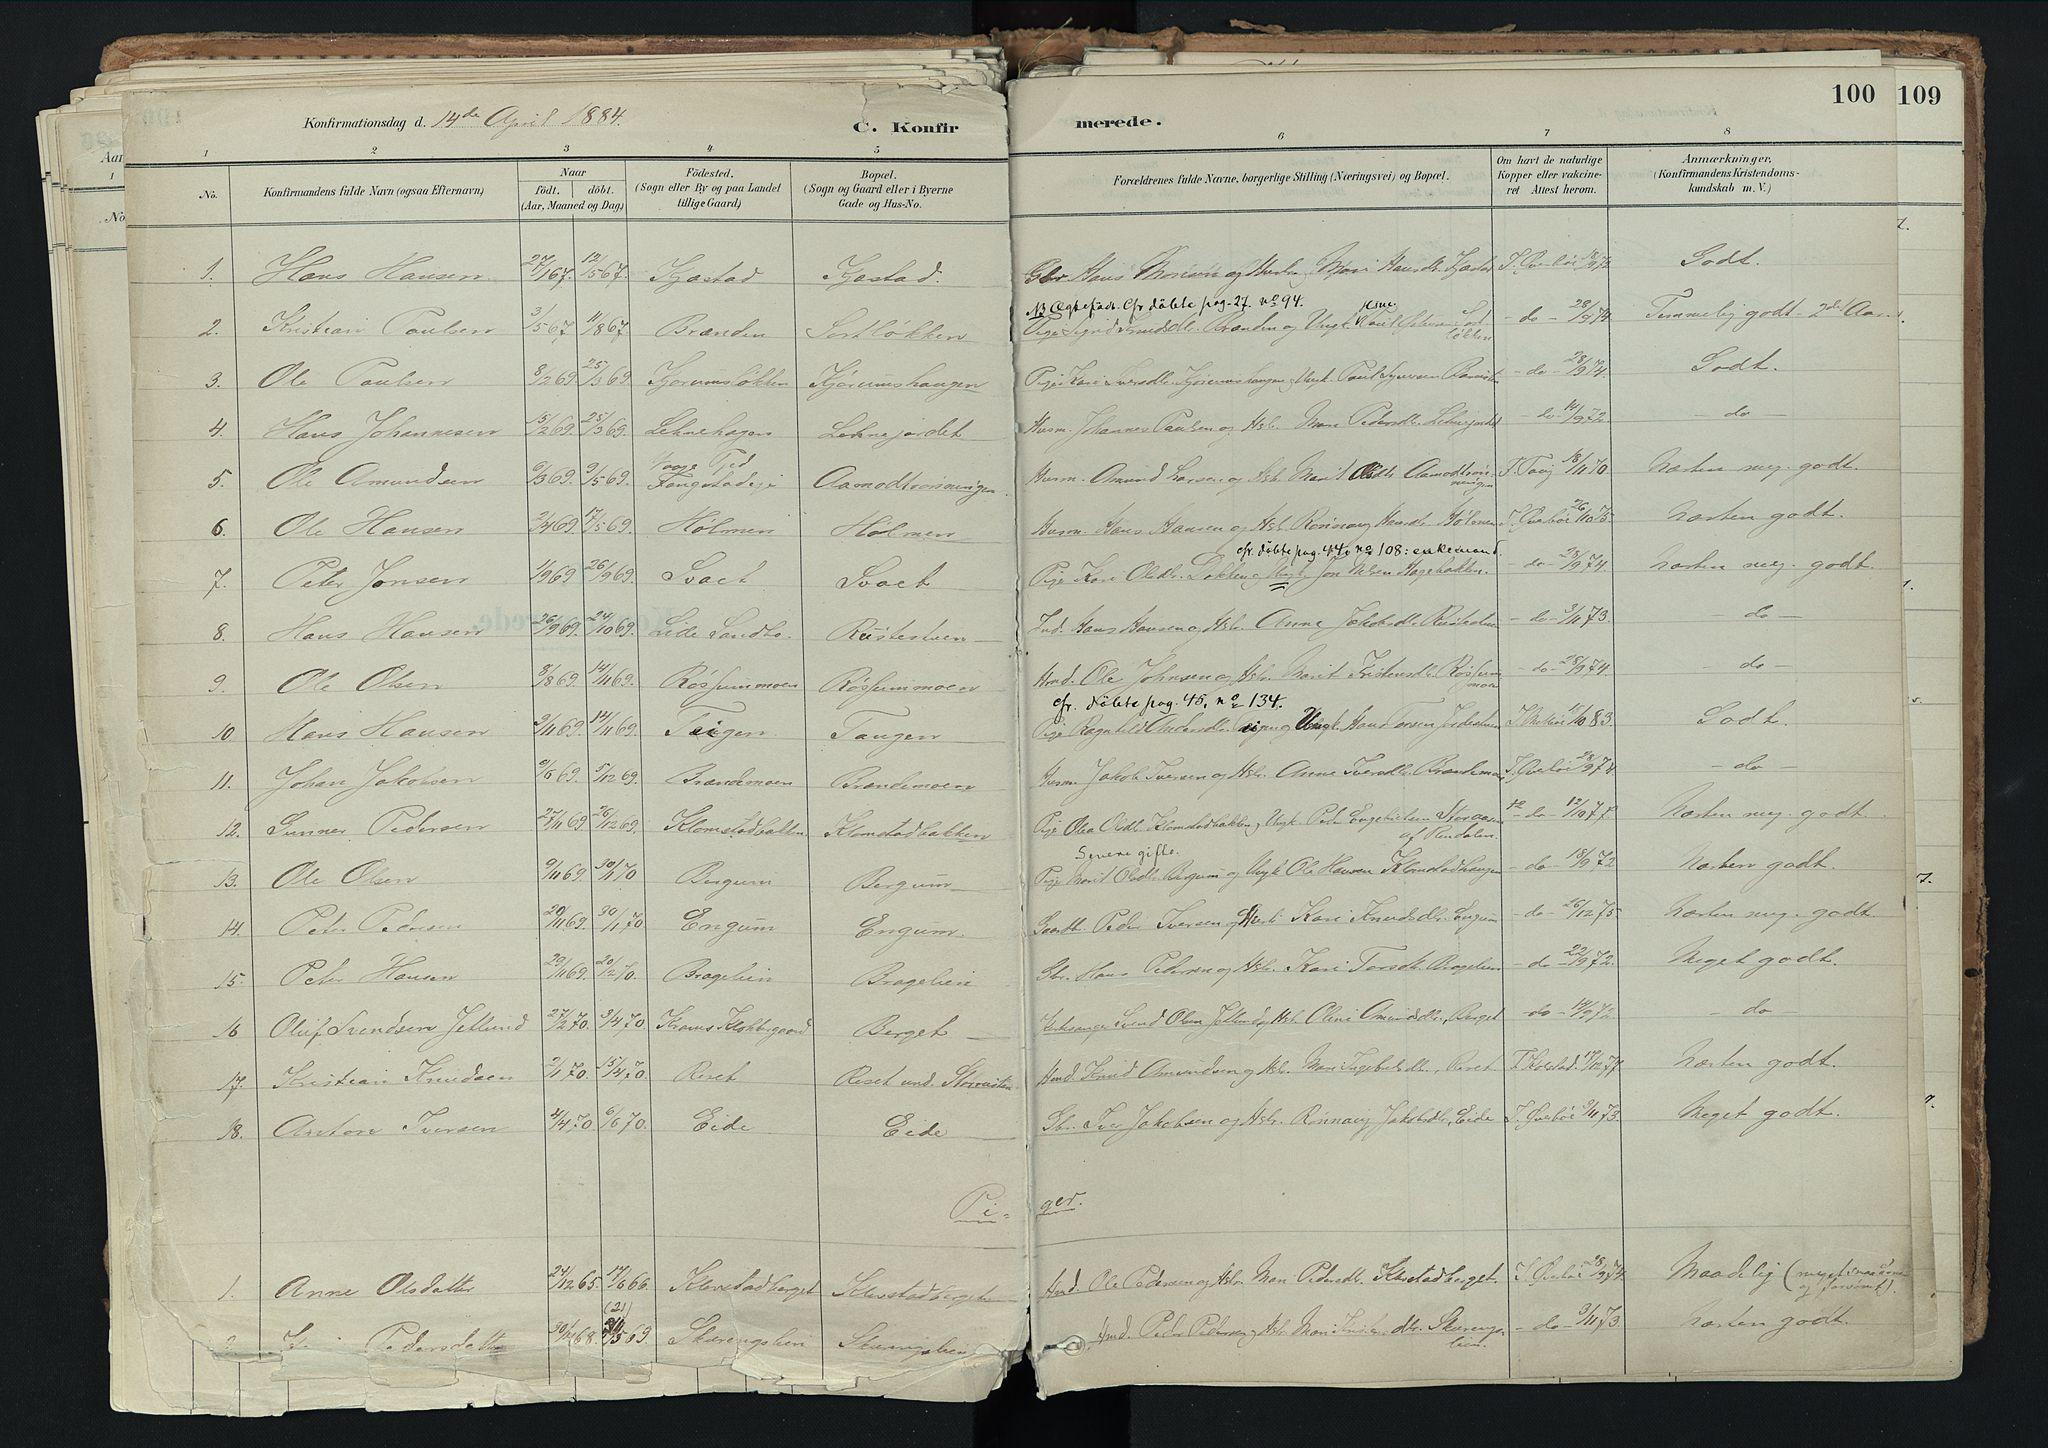 SAH, Nord-Fron prestekontor, Ministerialbok nr. 3, 1884-1914, s. 100